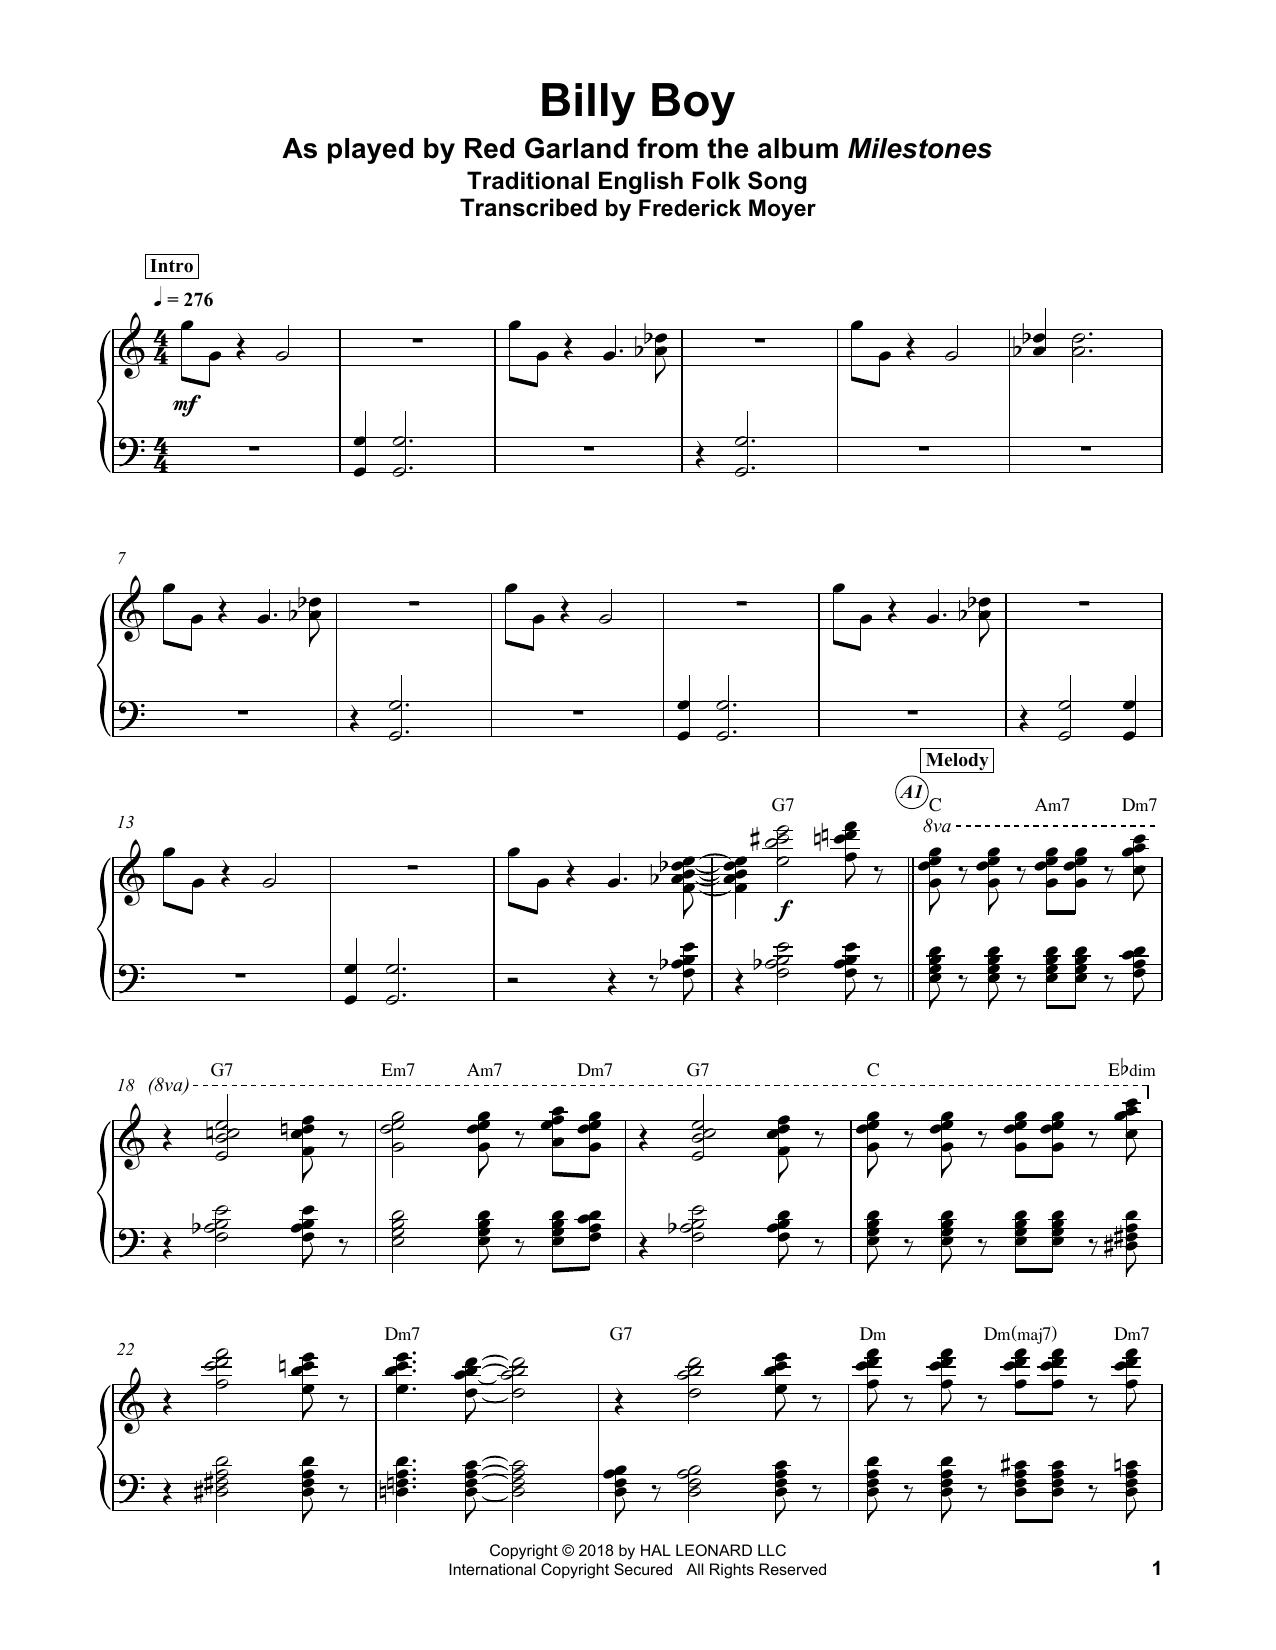 Traditional 'Billy Boy' Sheet Music Notes, Chords | Download Printable  Piano Transcription - SKU: 404170